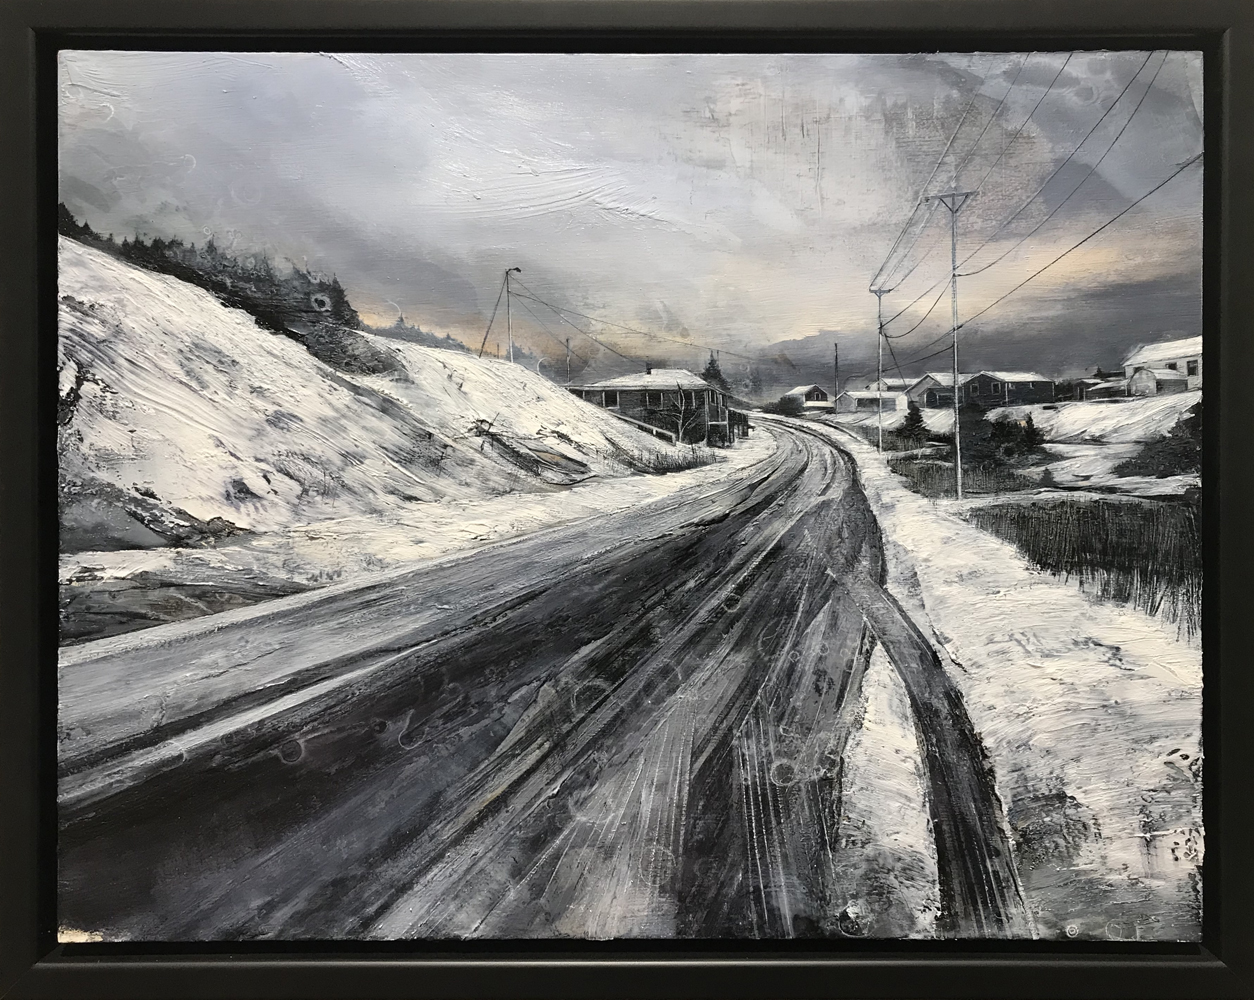 Mark Thompson, Closer Still, 2020, oil on panel, 14 x 18 inches, framed, $2000.